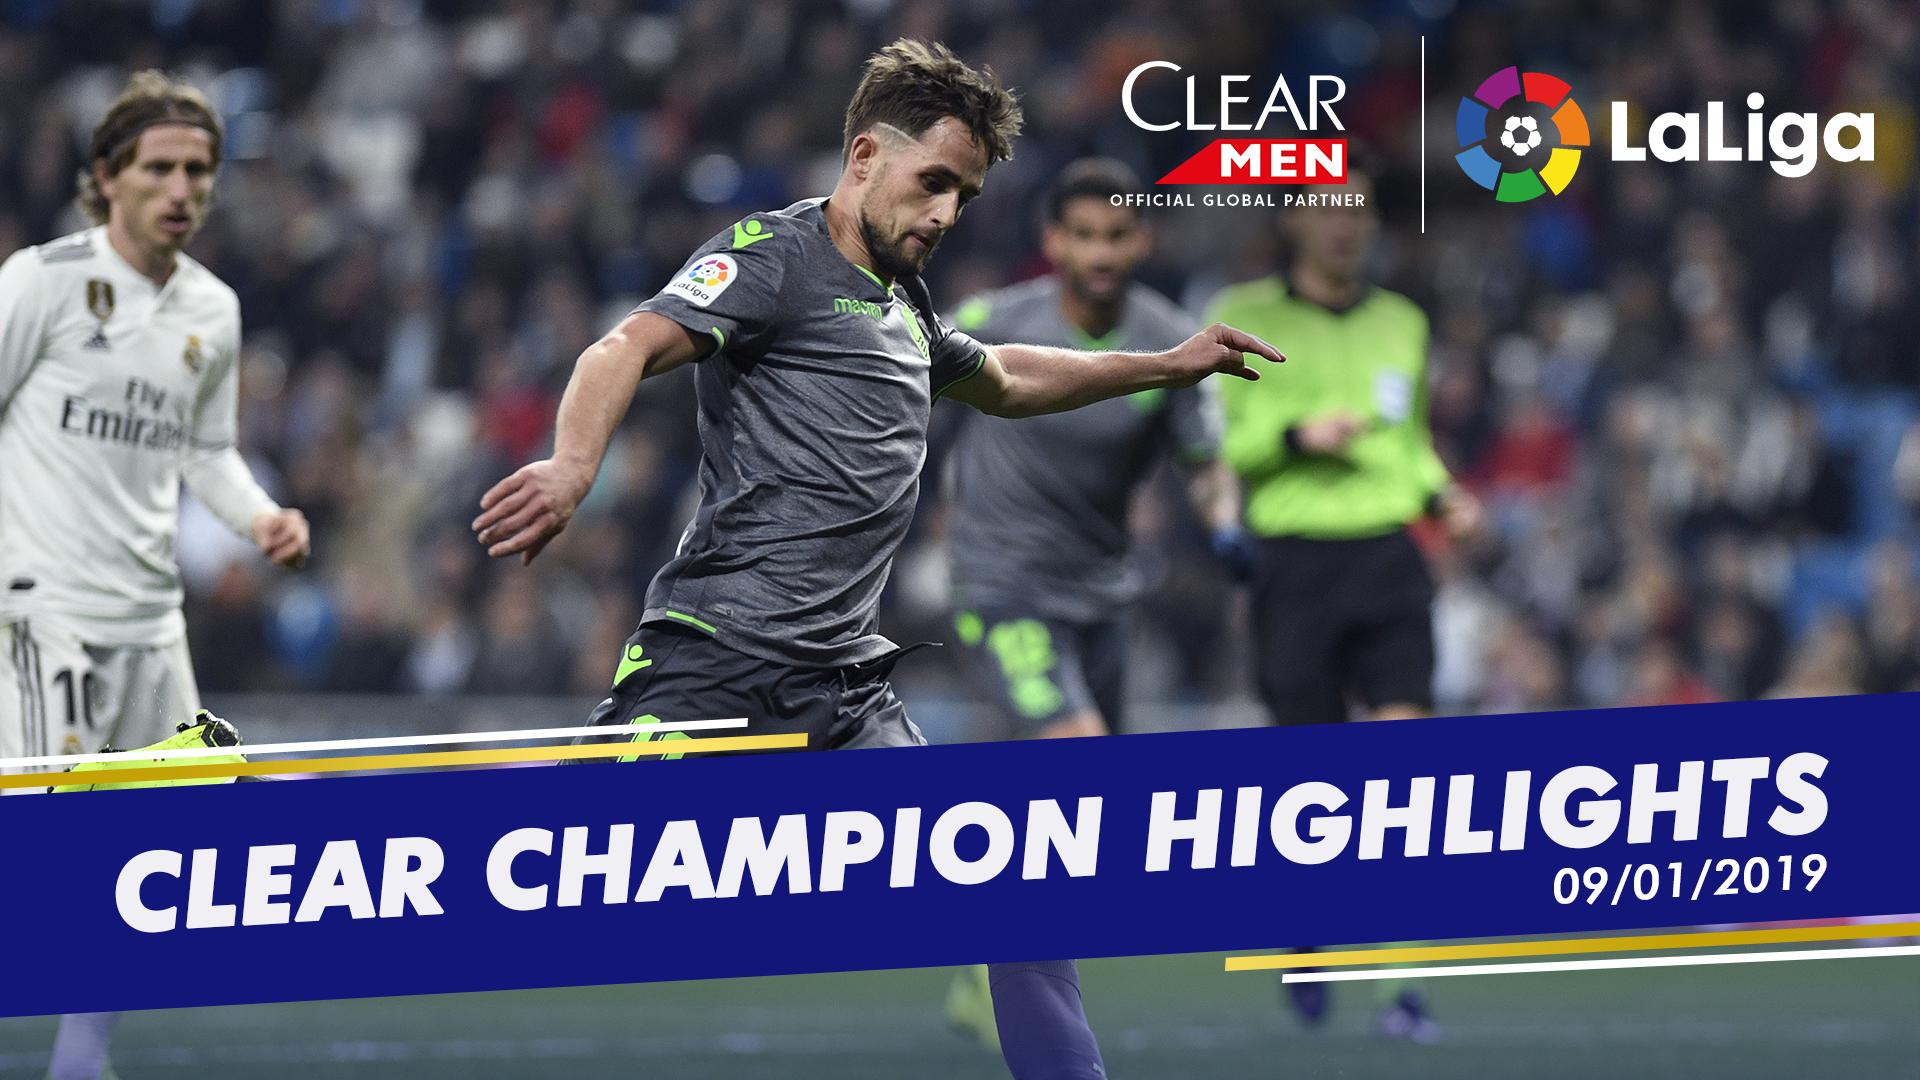 Liga Clear Thumbnail 09012018